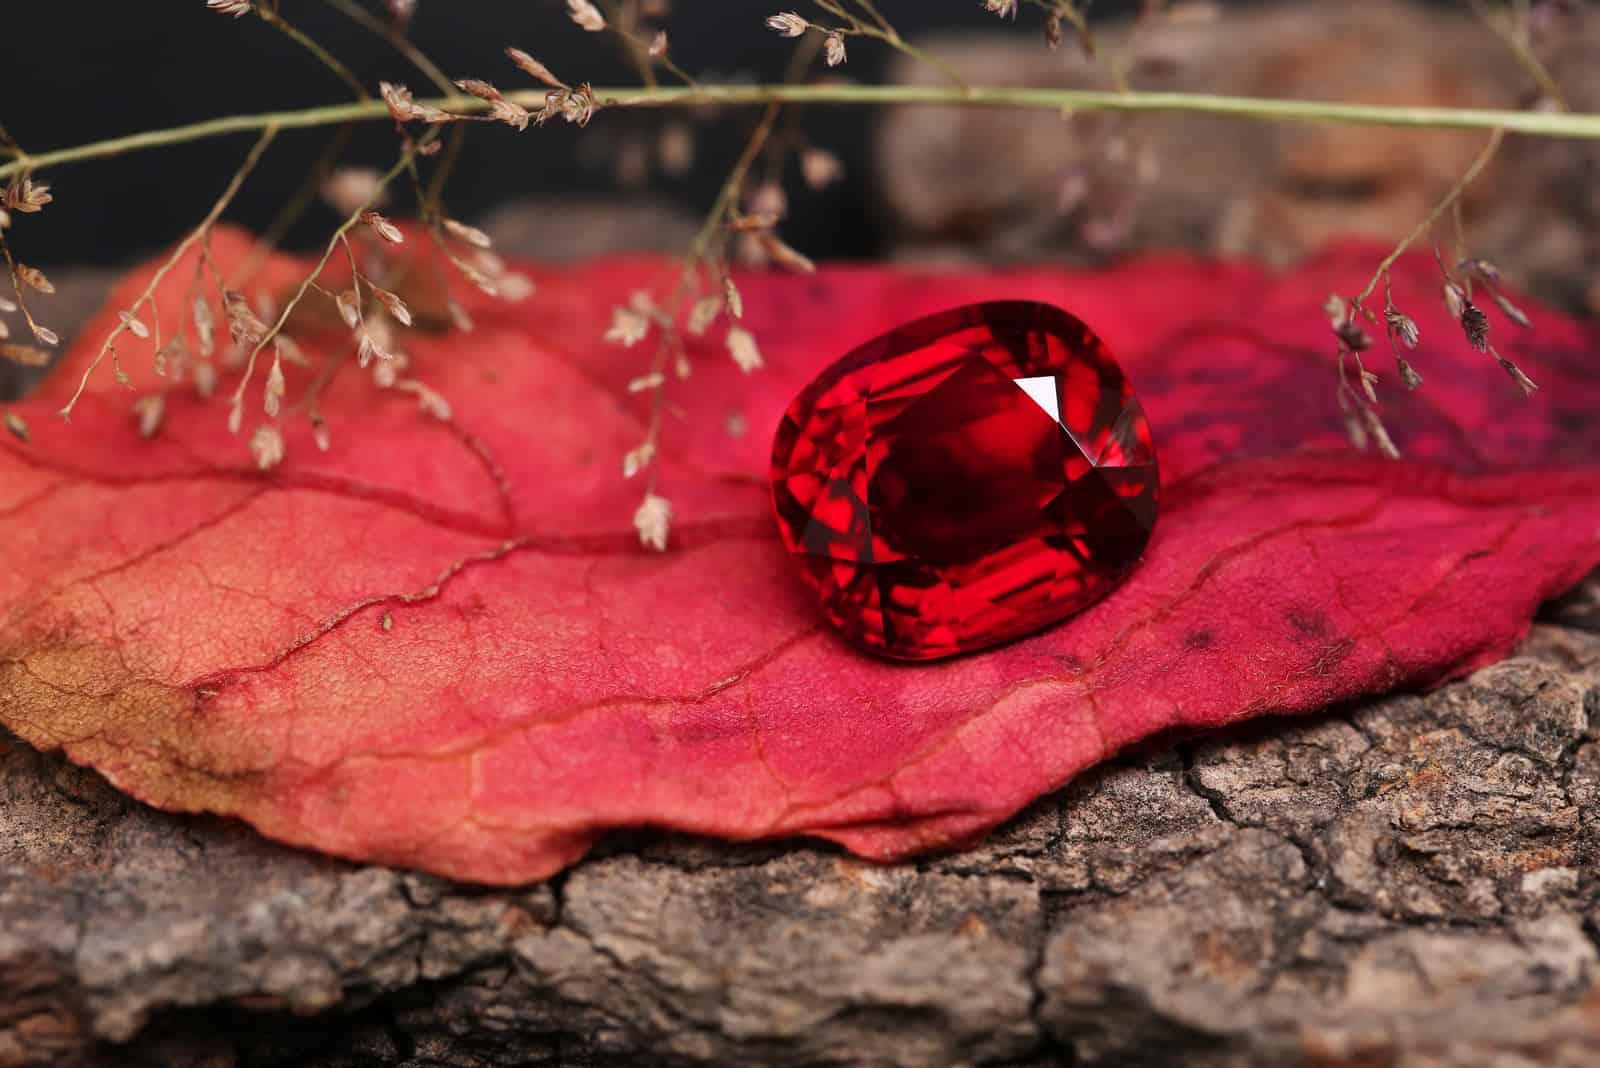 Rubin auf trockenem Blatt in der Natur